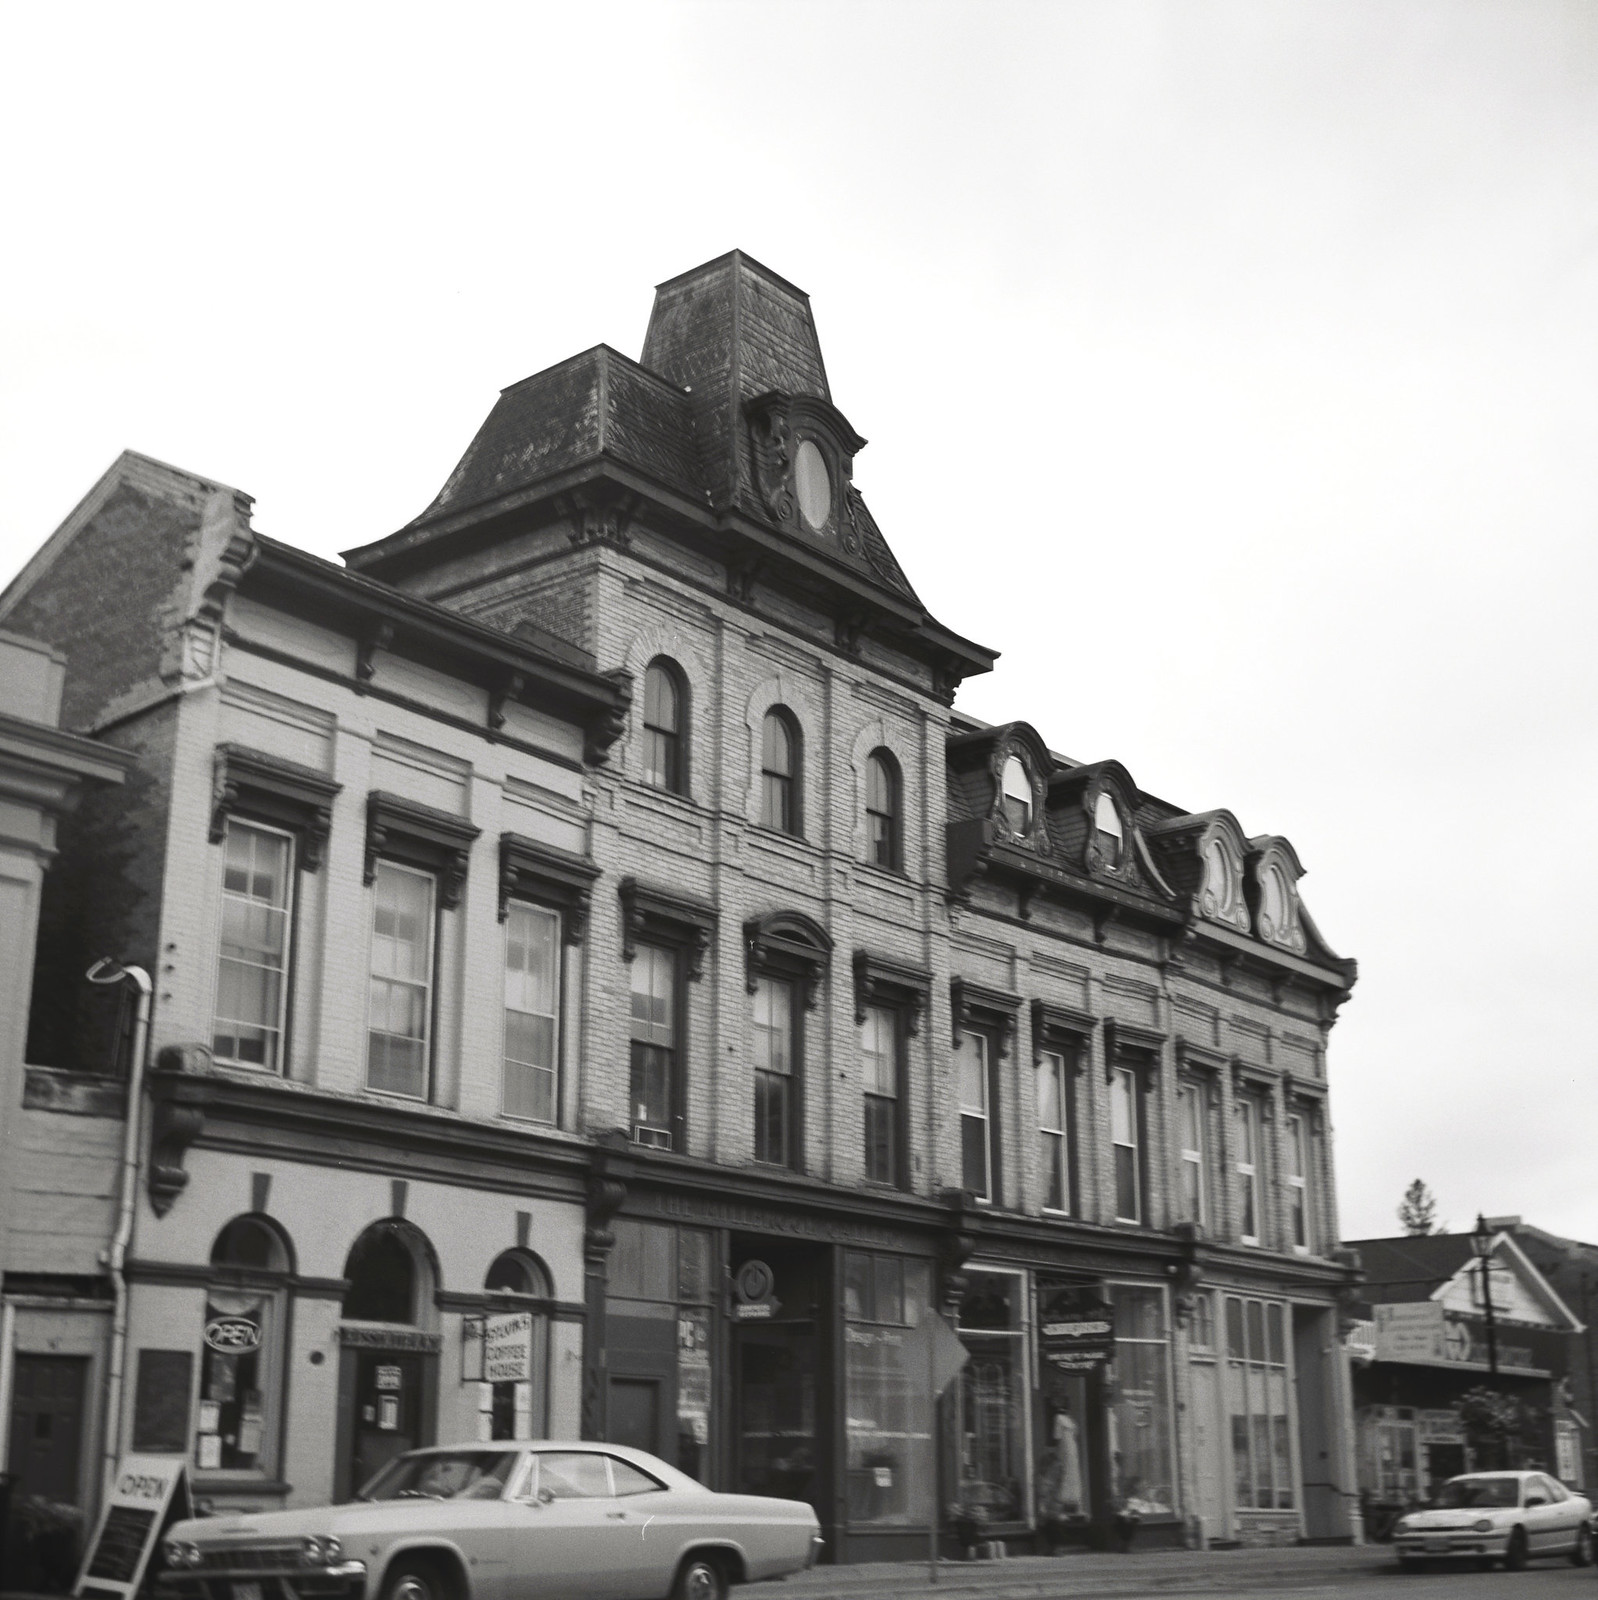 Downtown Millbrook